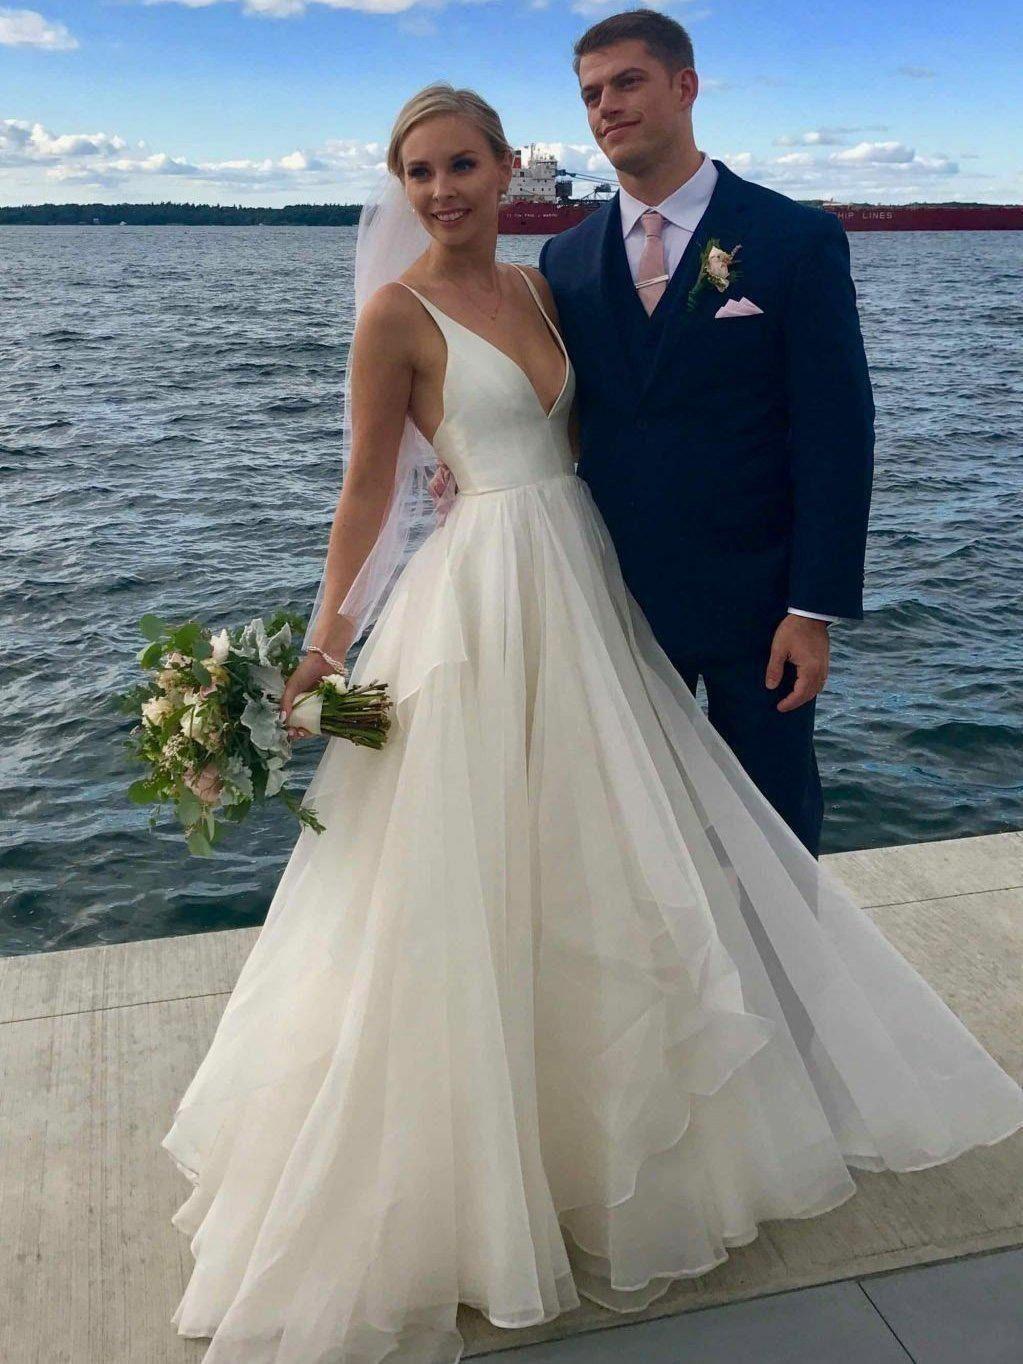 Dresses to wear to a destination wedding as a guest  Spaghetti Strap Ivory Chiffon Beach Wedding Dresses Cheap V Neck